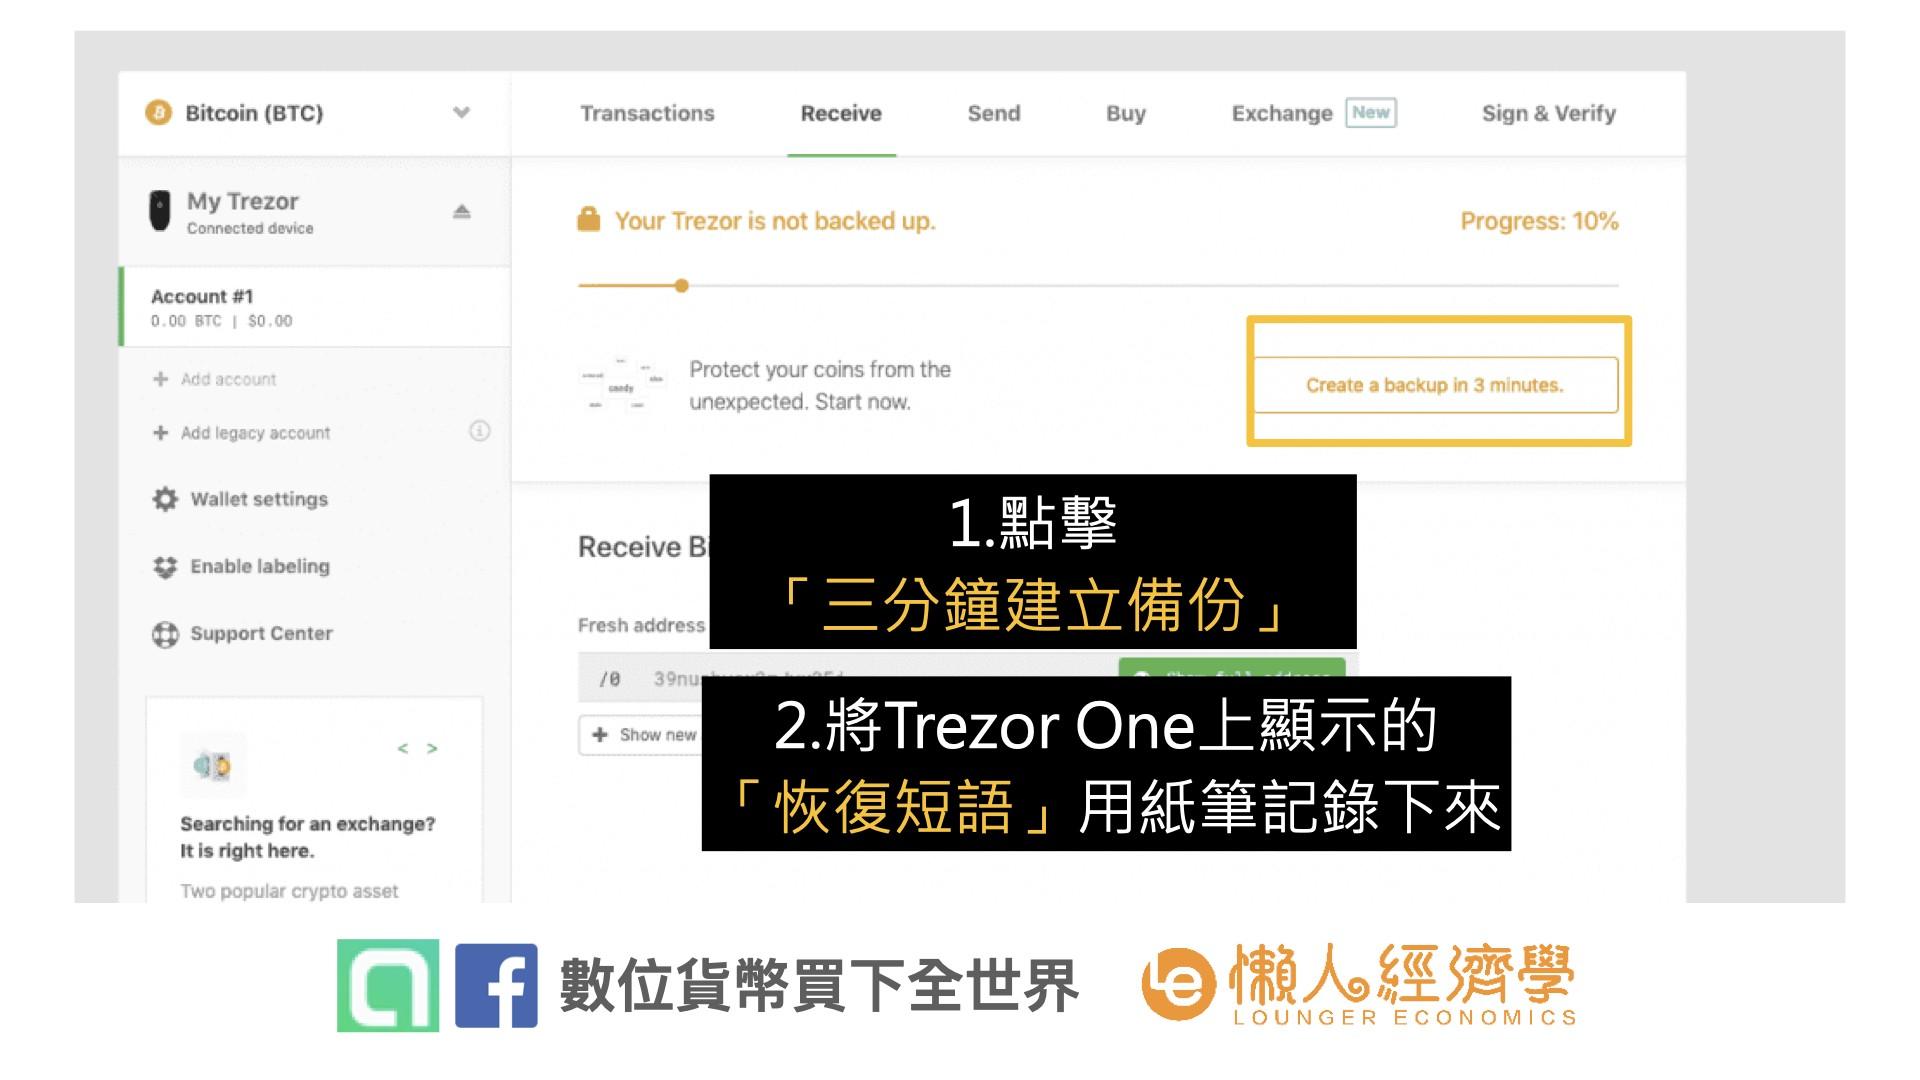 Trezor Wallet 設定教學:紀錄恢復短語